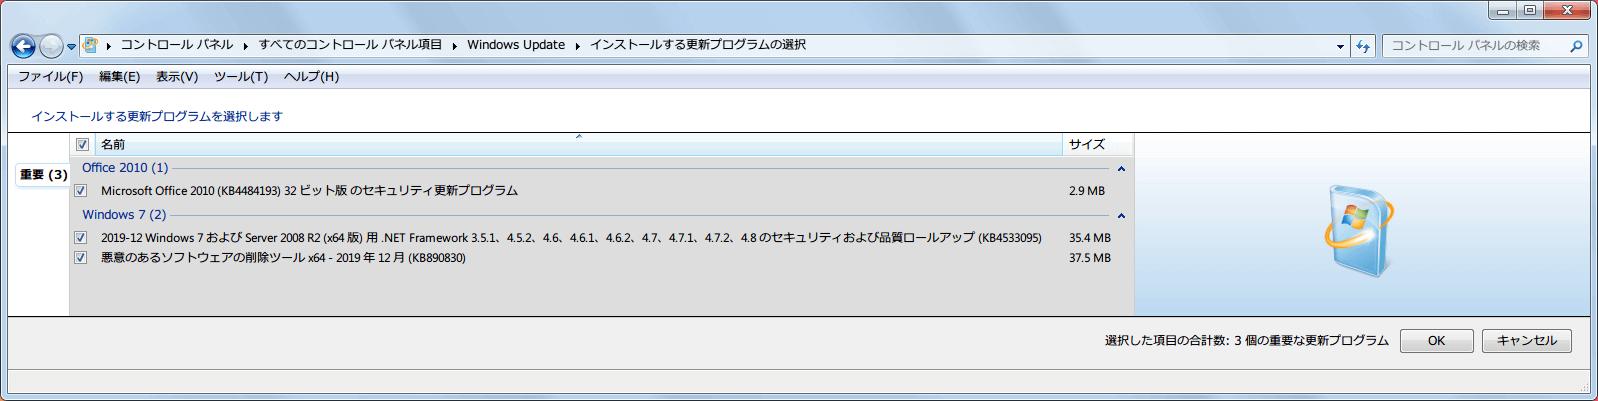 Windows 7 64bit Windows Update 重要 2019年12月公開分更新プログラム(重要)インストール